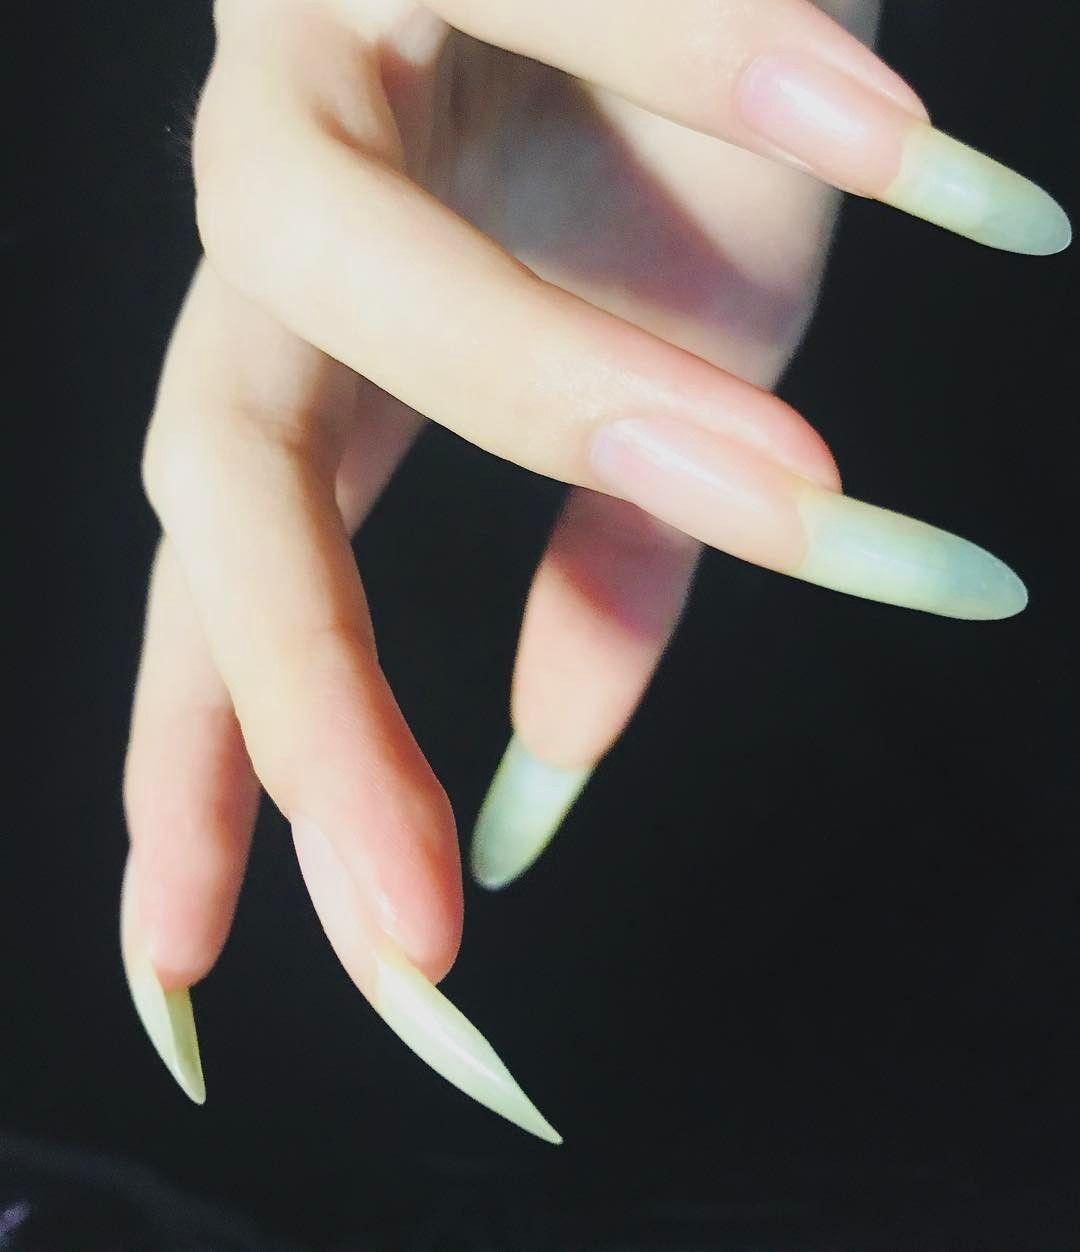 longnails #beautifulnails #mynails #handmodel #hand #nails #nailsart ...